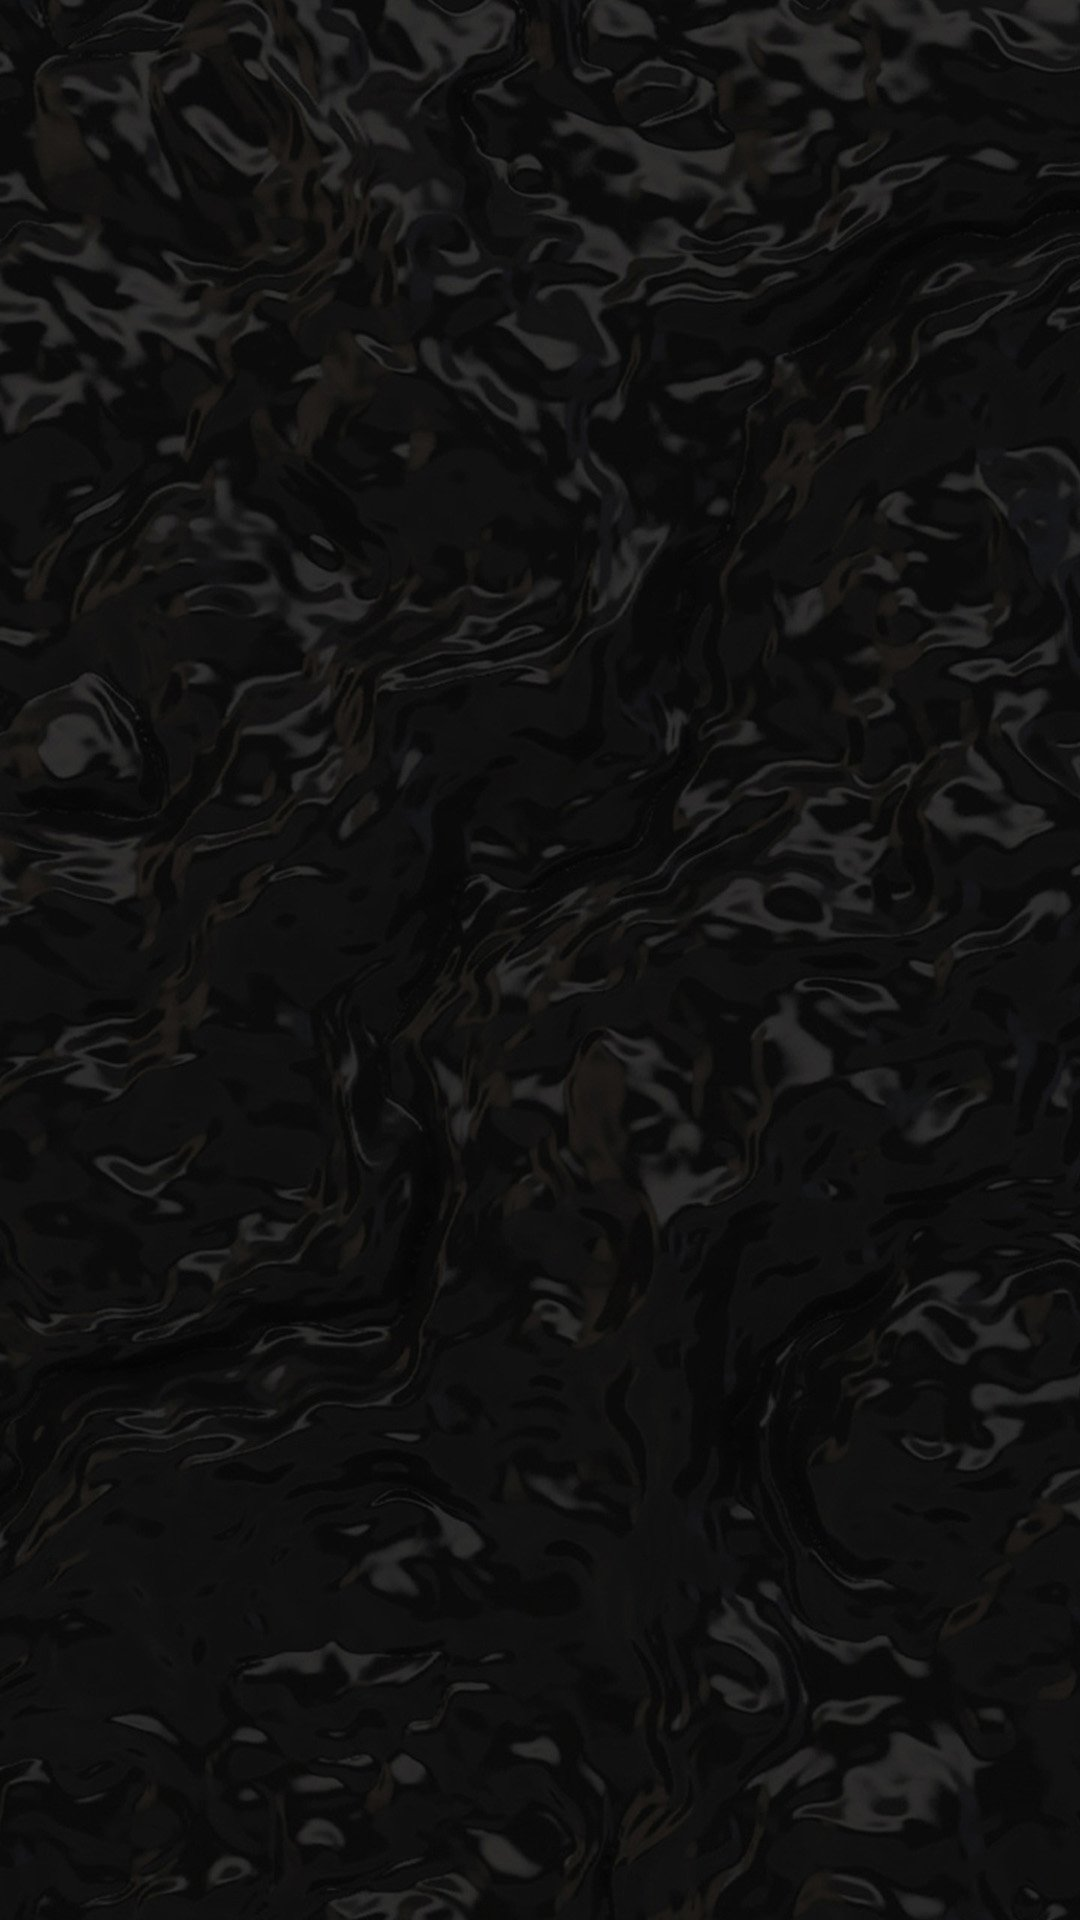 33 Samsung Galaxy S5 Black Wallpaper On Wallpapersafari